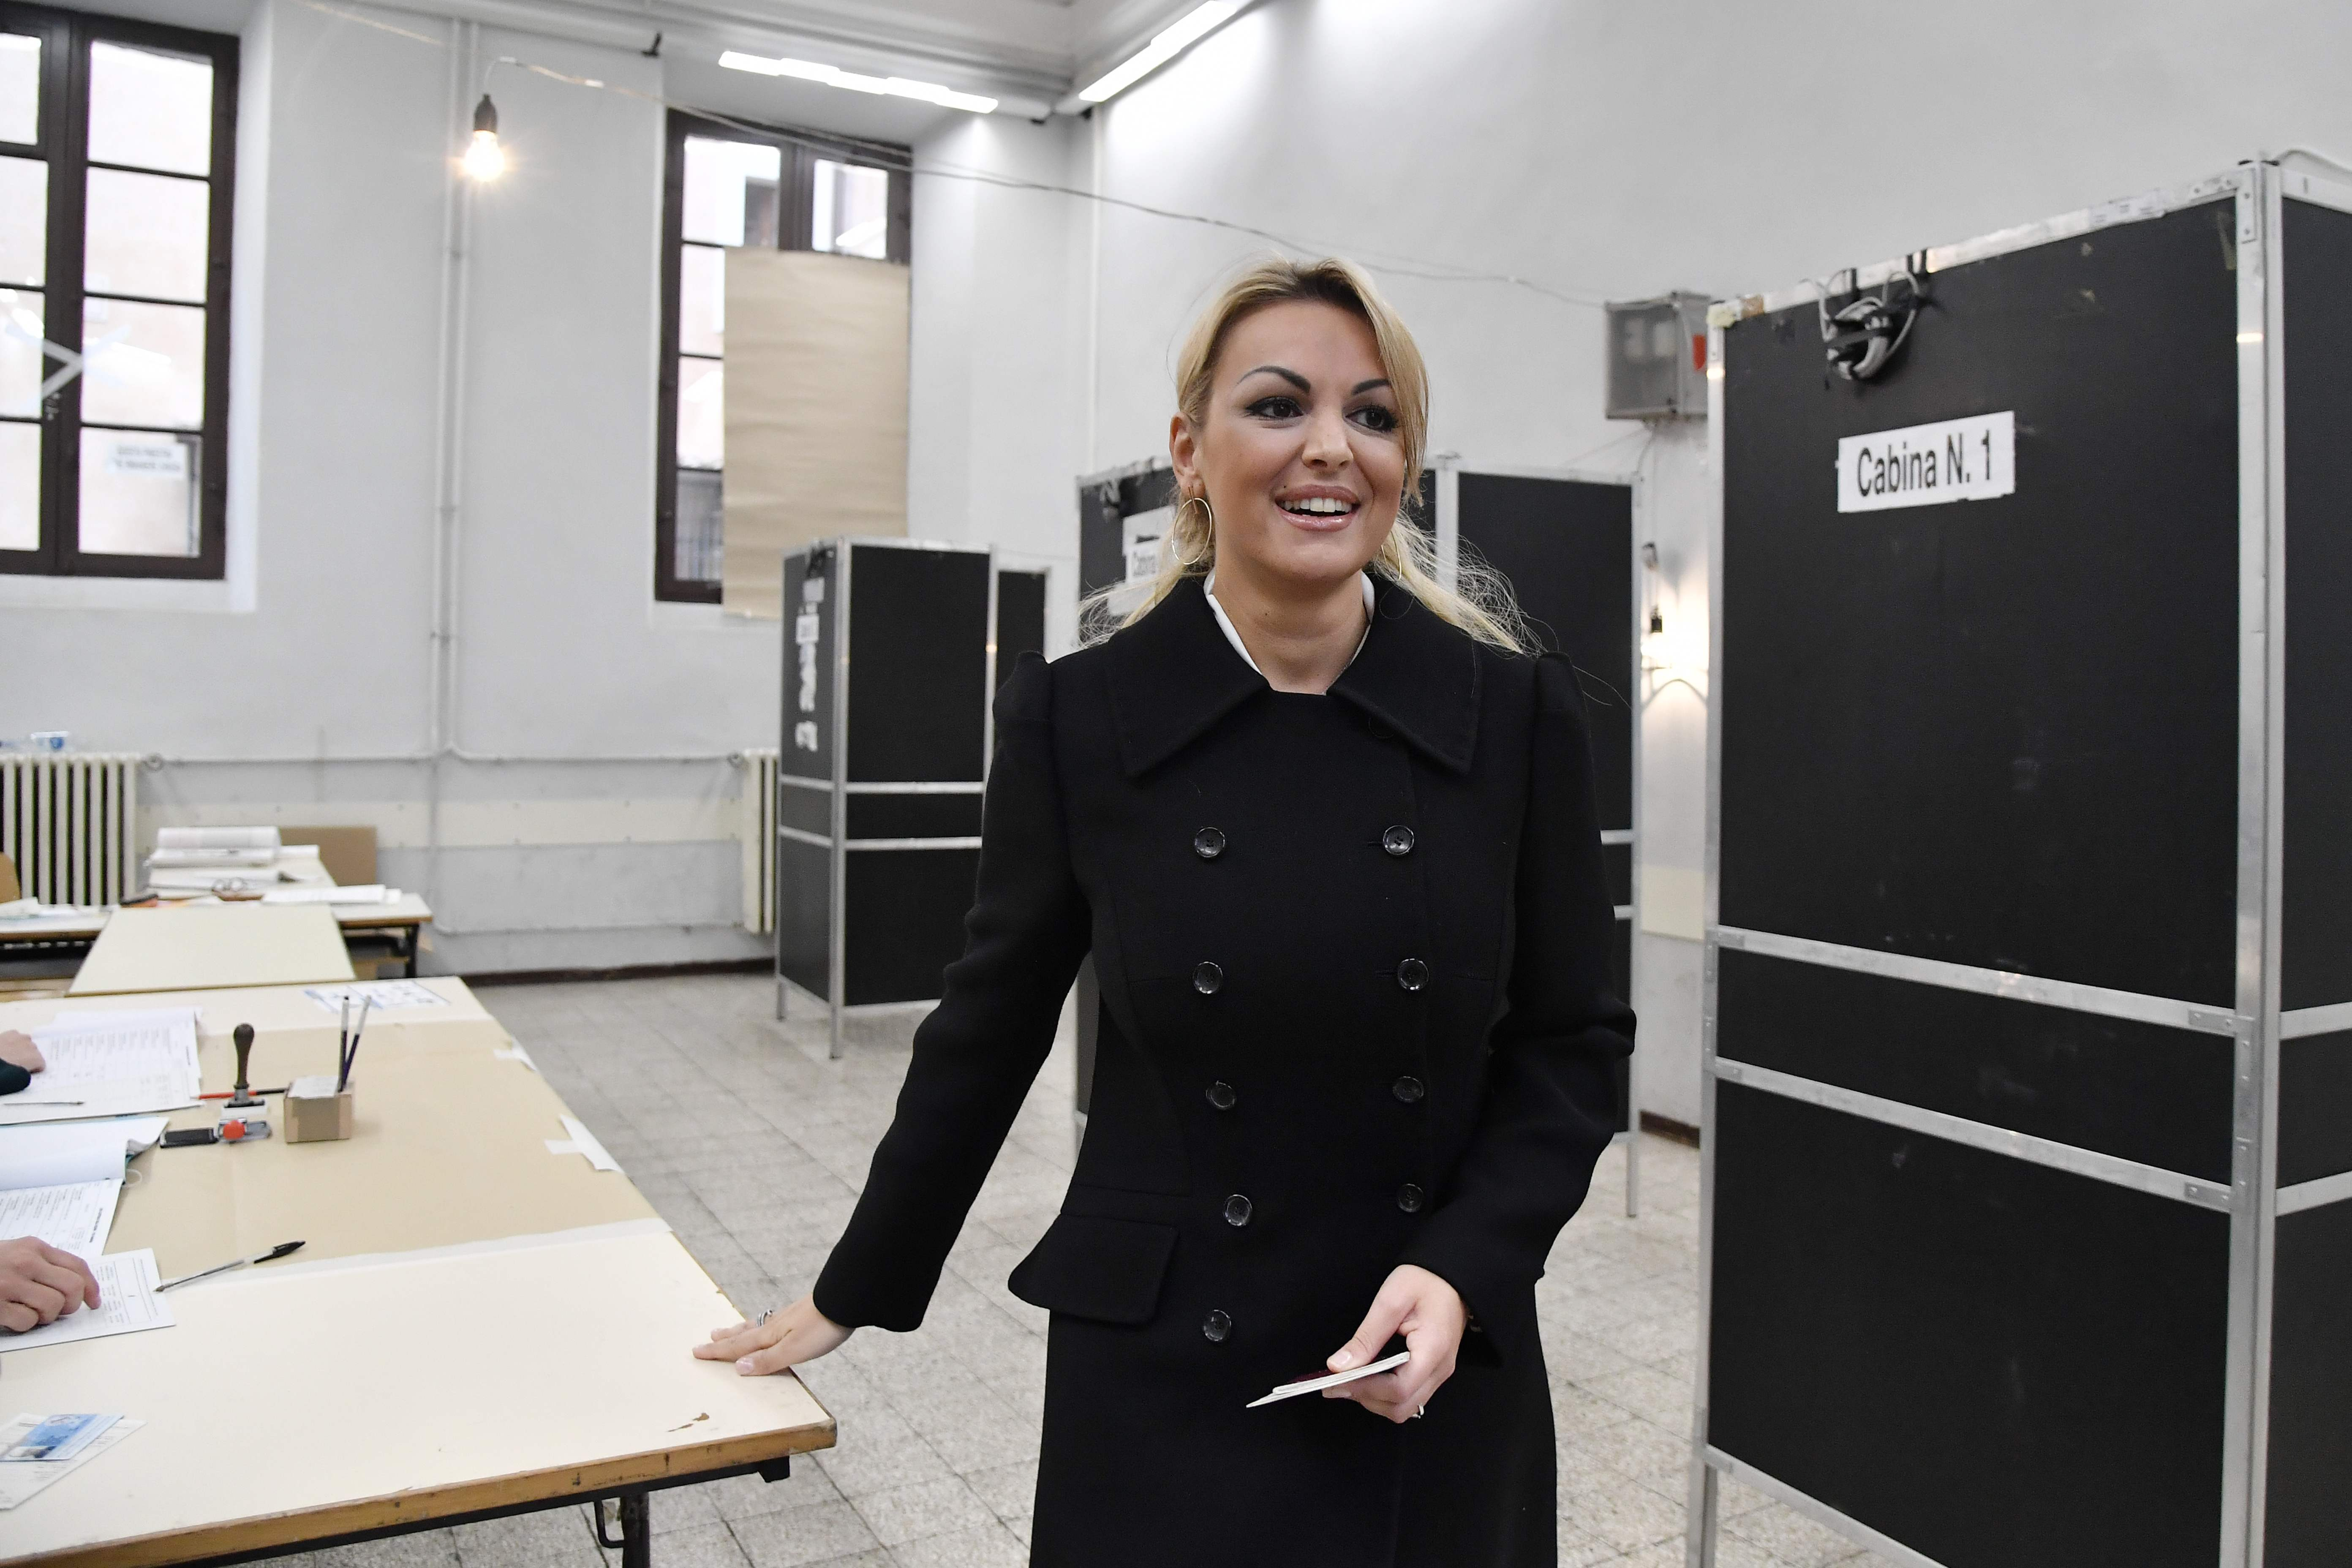 فرانشيسكا باسكال تدلى بصوتها فى انتخابات إيطاليا